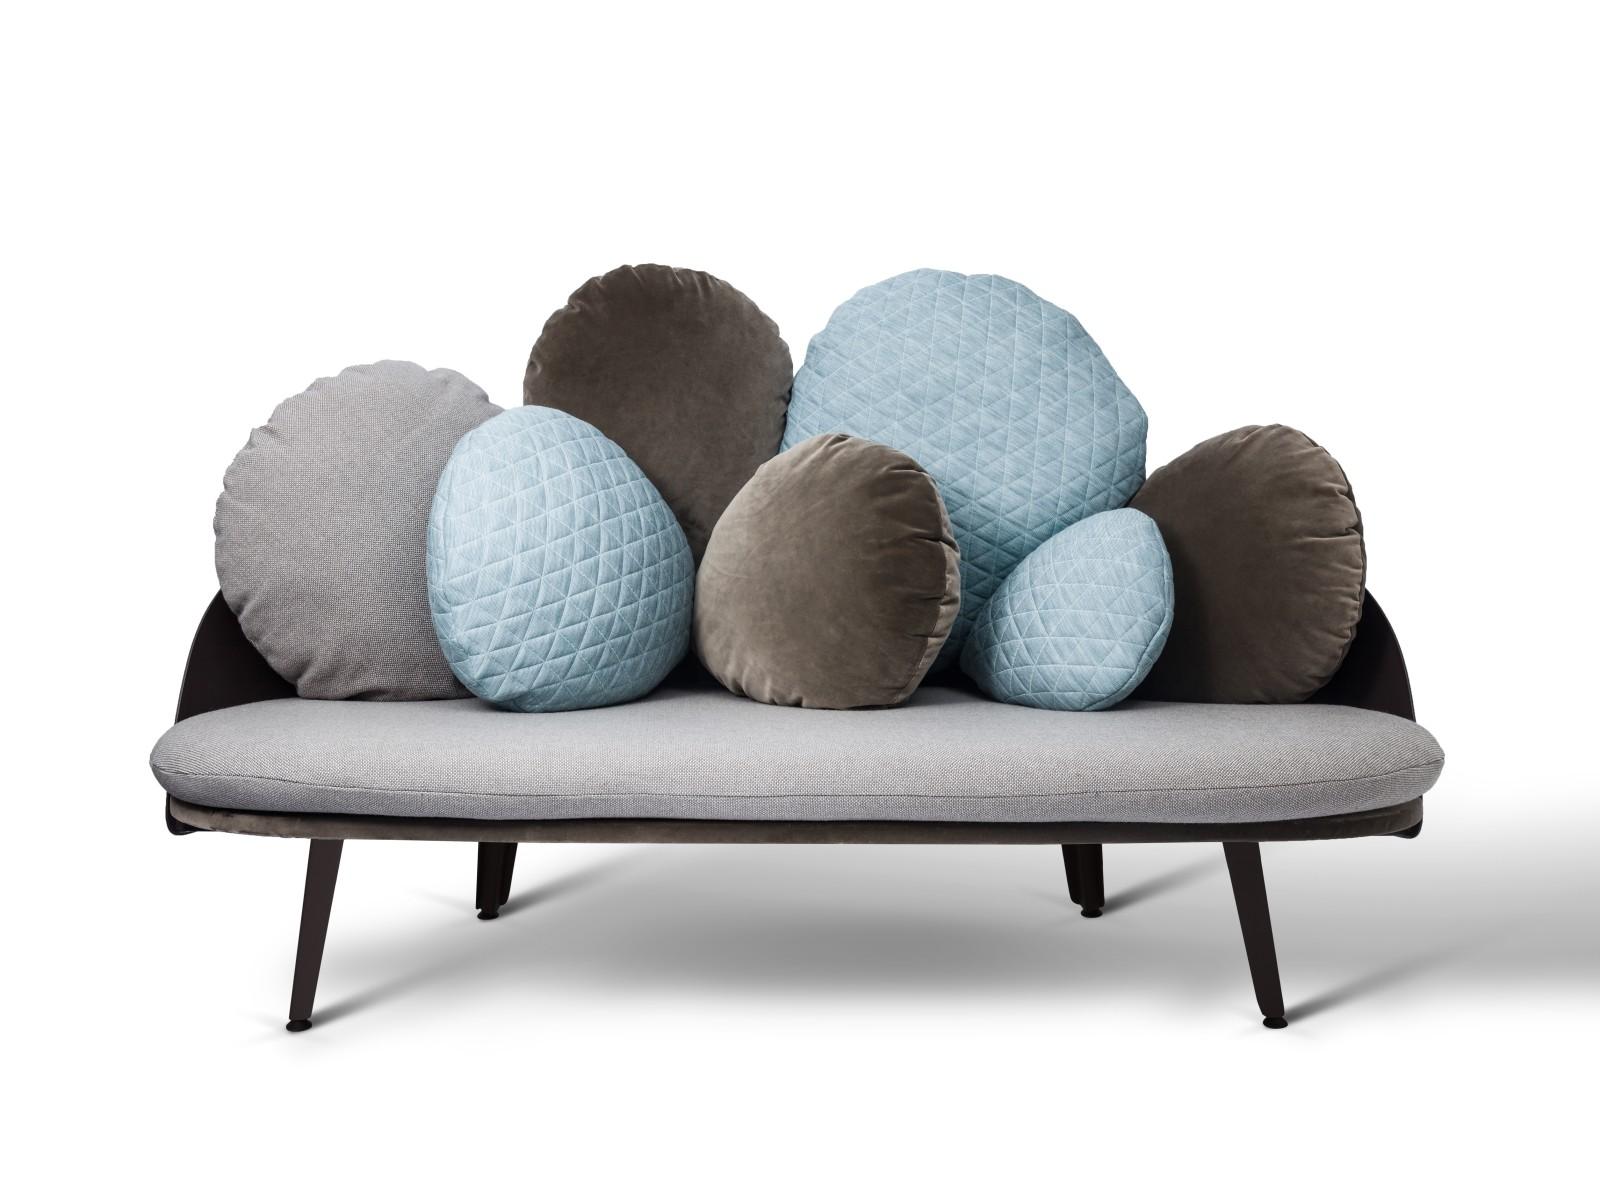 Nubilo Sofa Beige, Turquoise